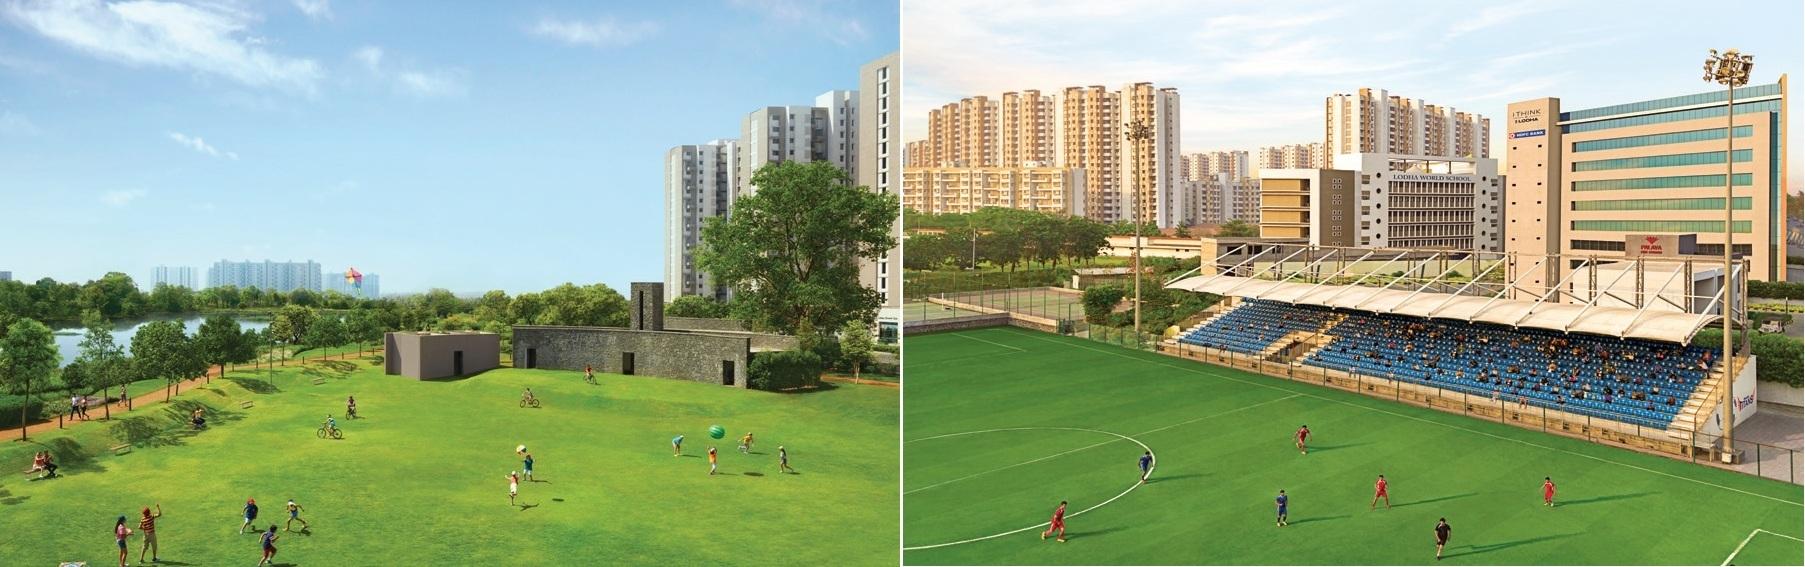 lodha palava aquaville series estela d to g amenities features8